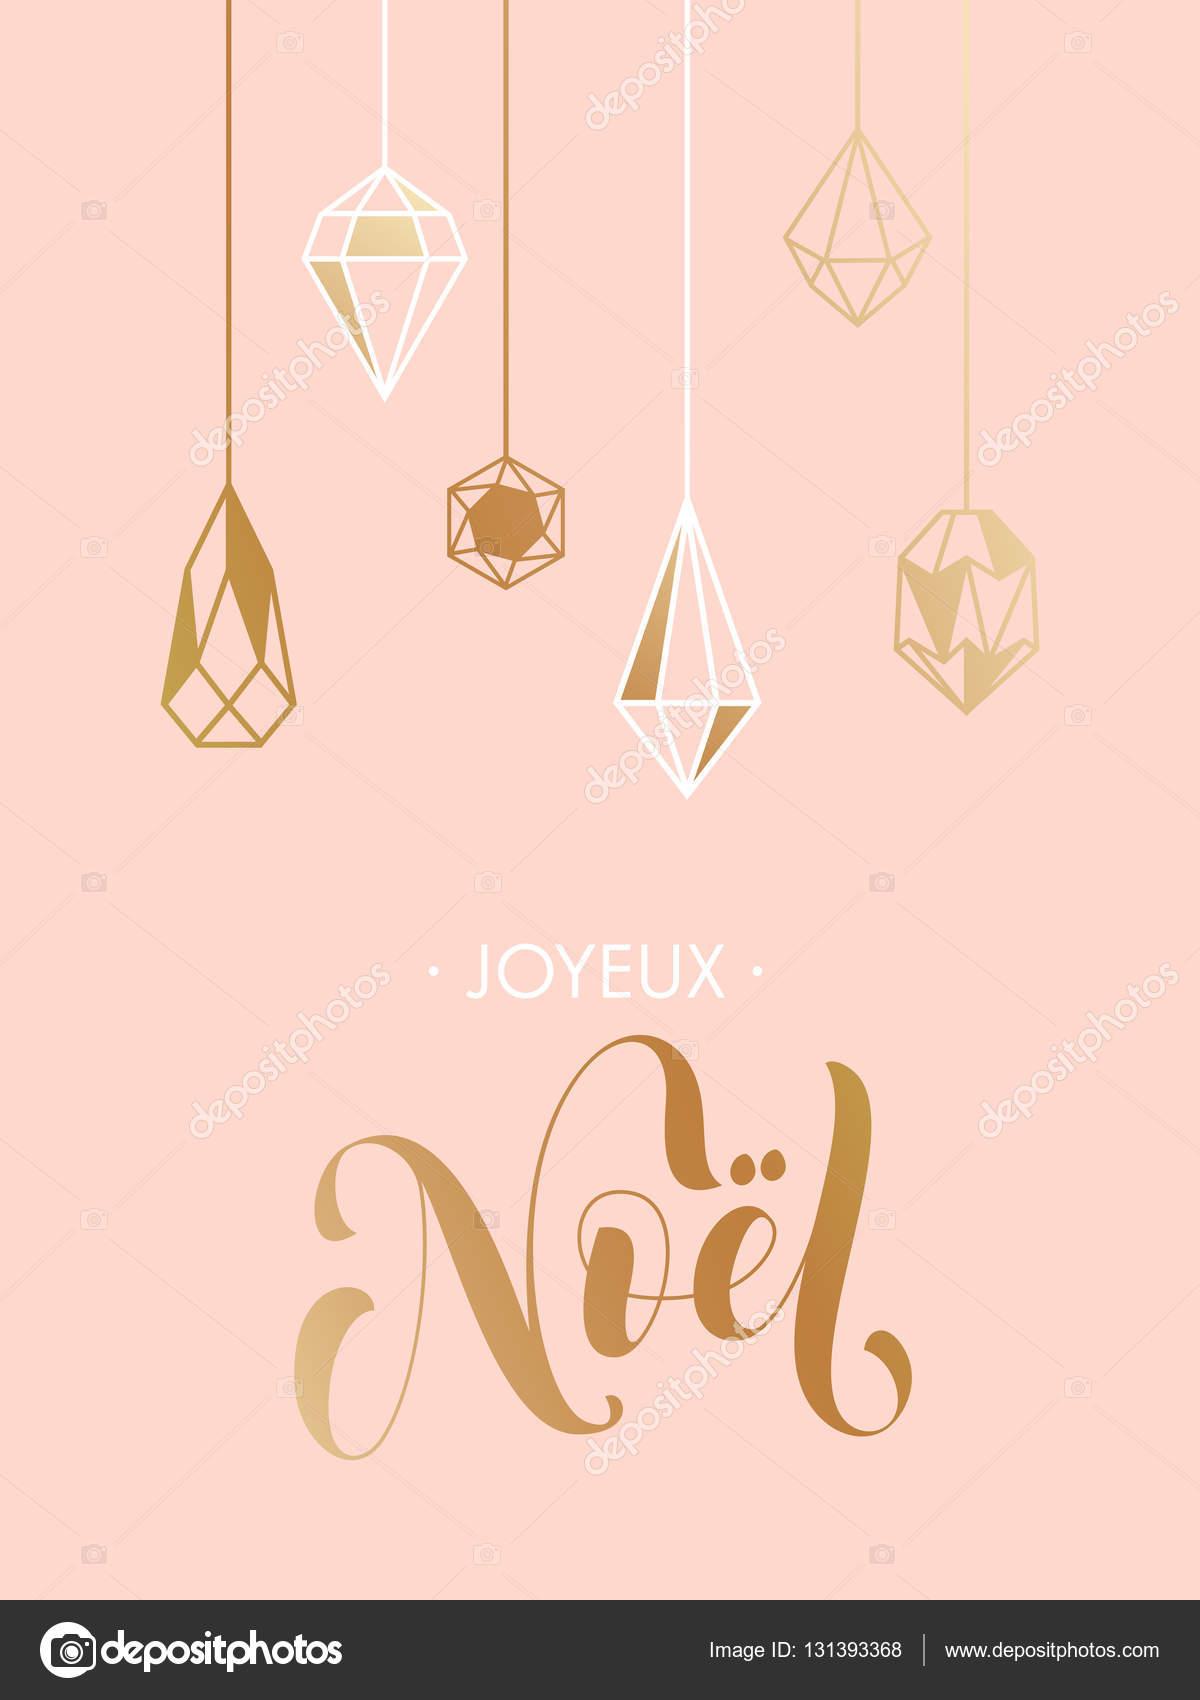 Tarjeta De Felicitación Feliz Navidad Joyeux Noel De Francés